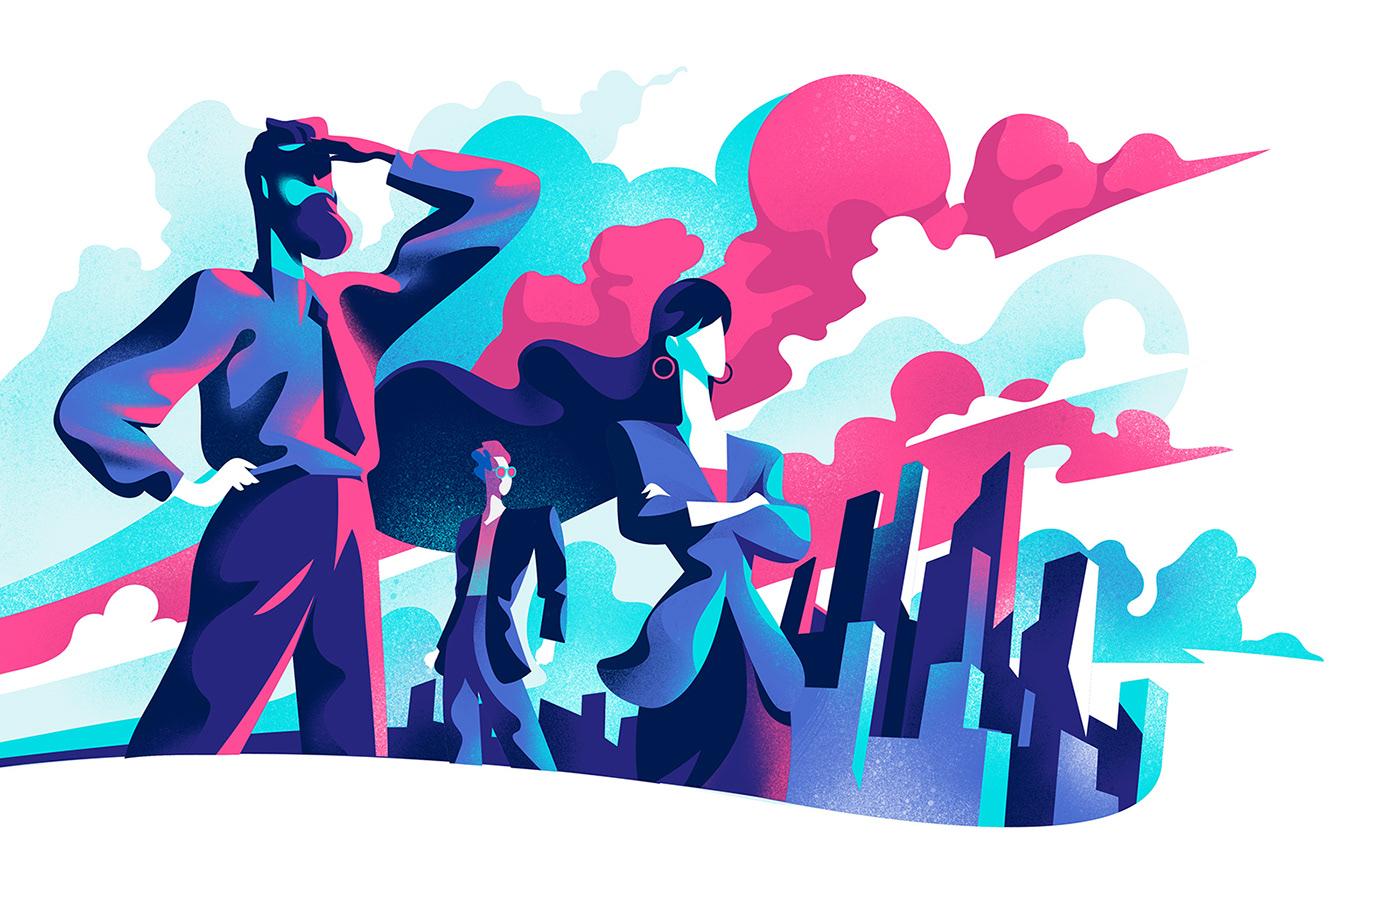 art concpet art Drawing  hero illustration  illustrations stock illustrations